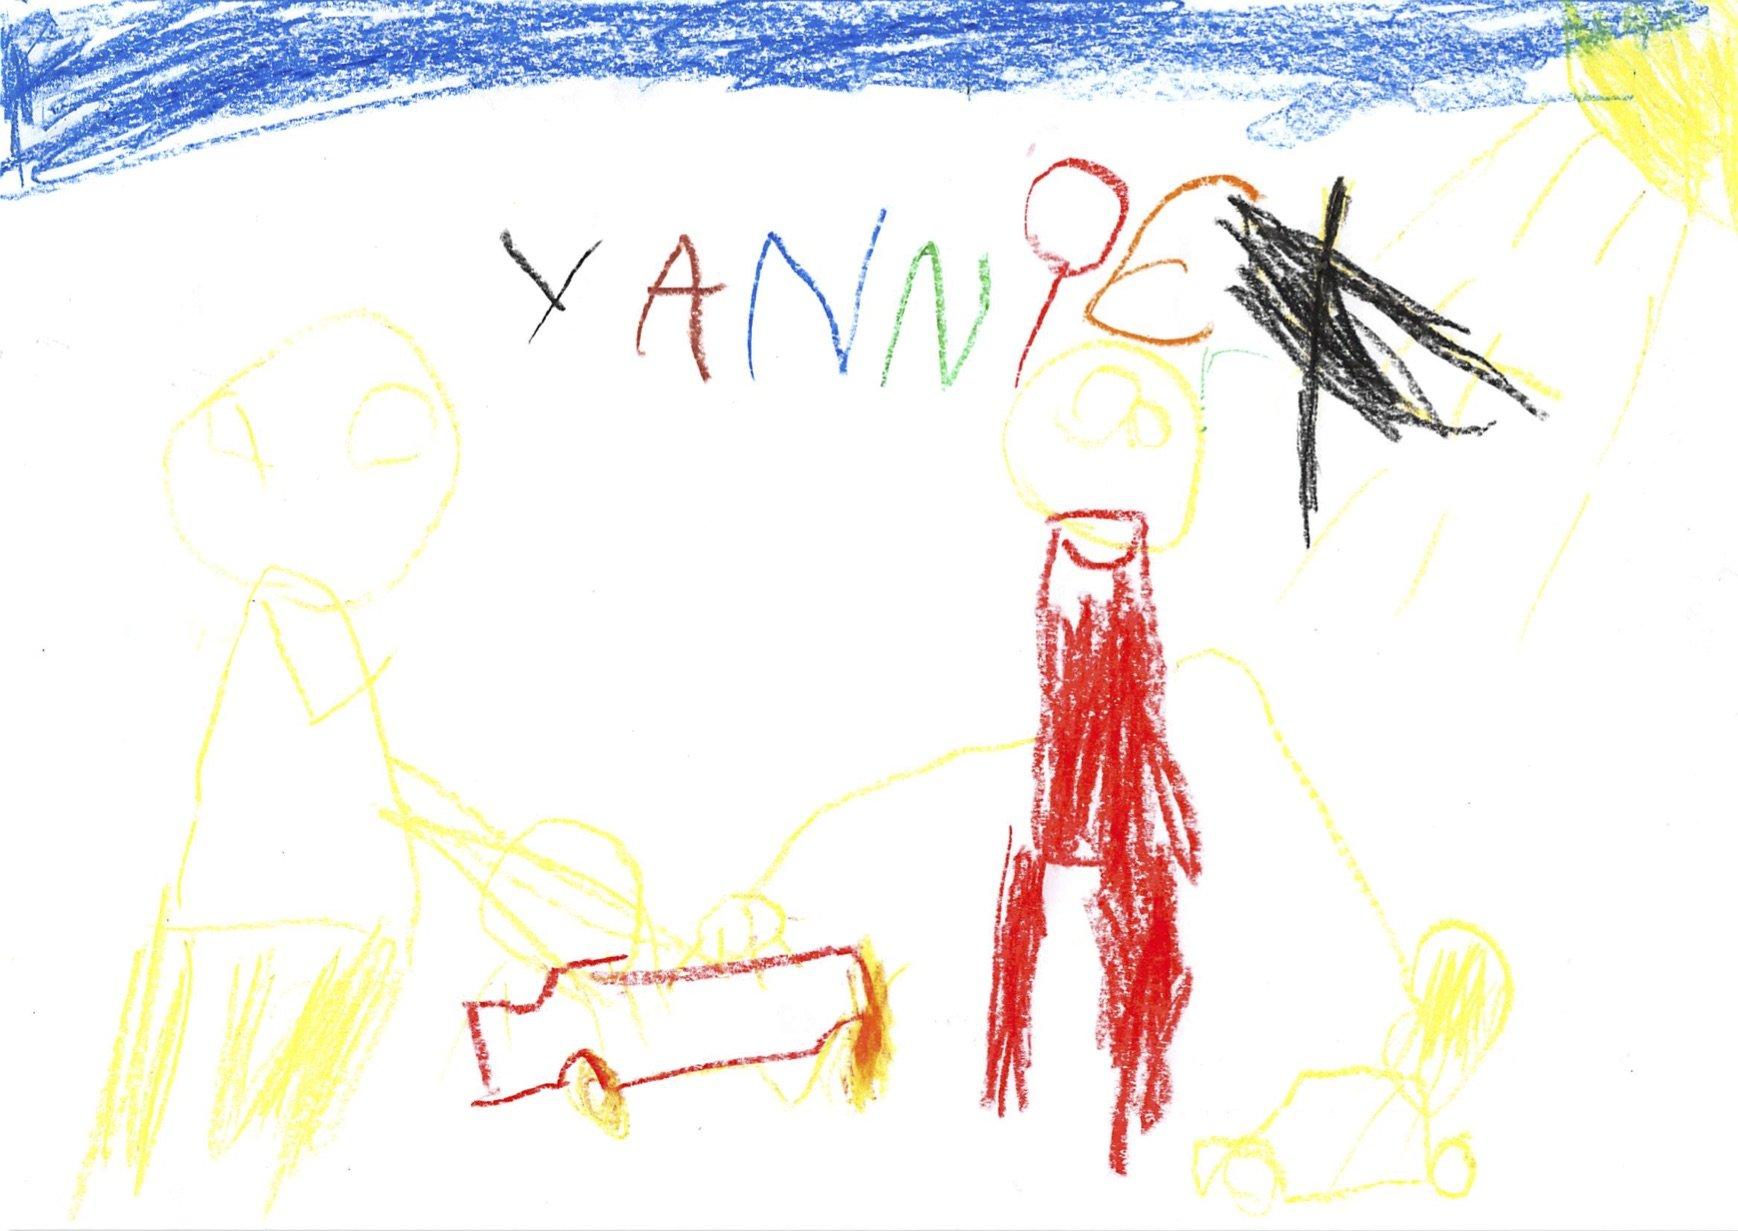 Yannick 6